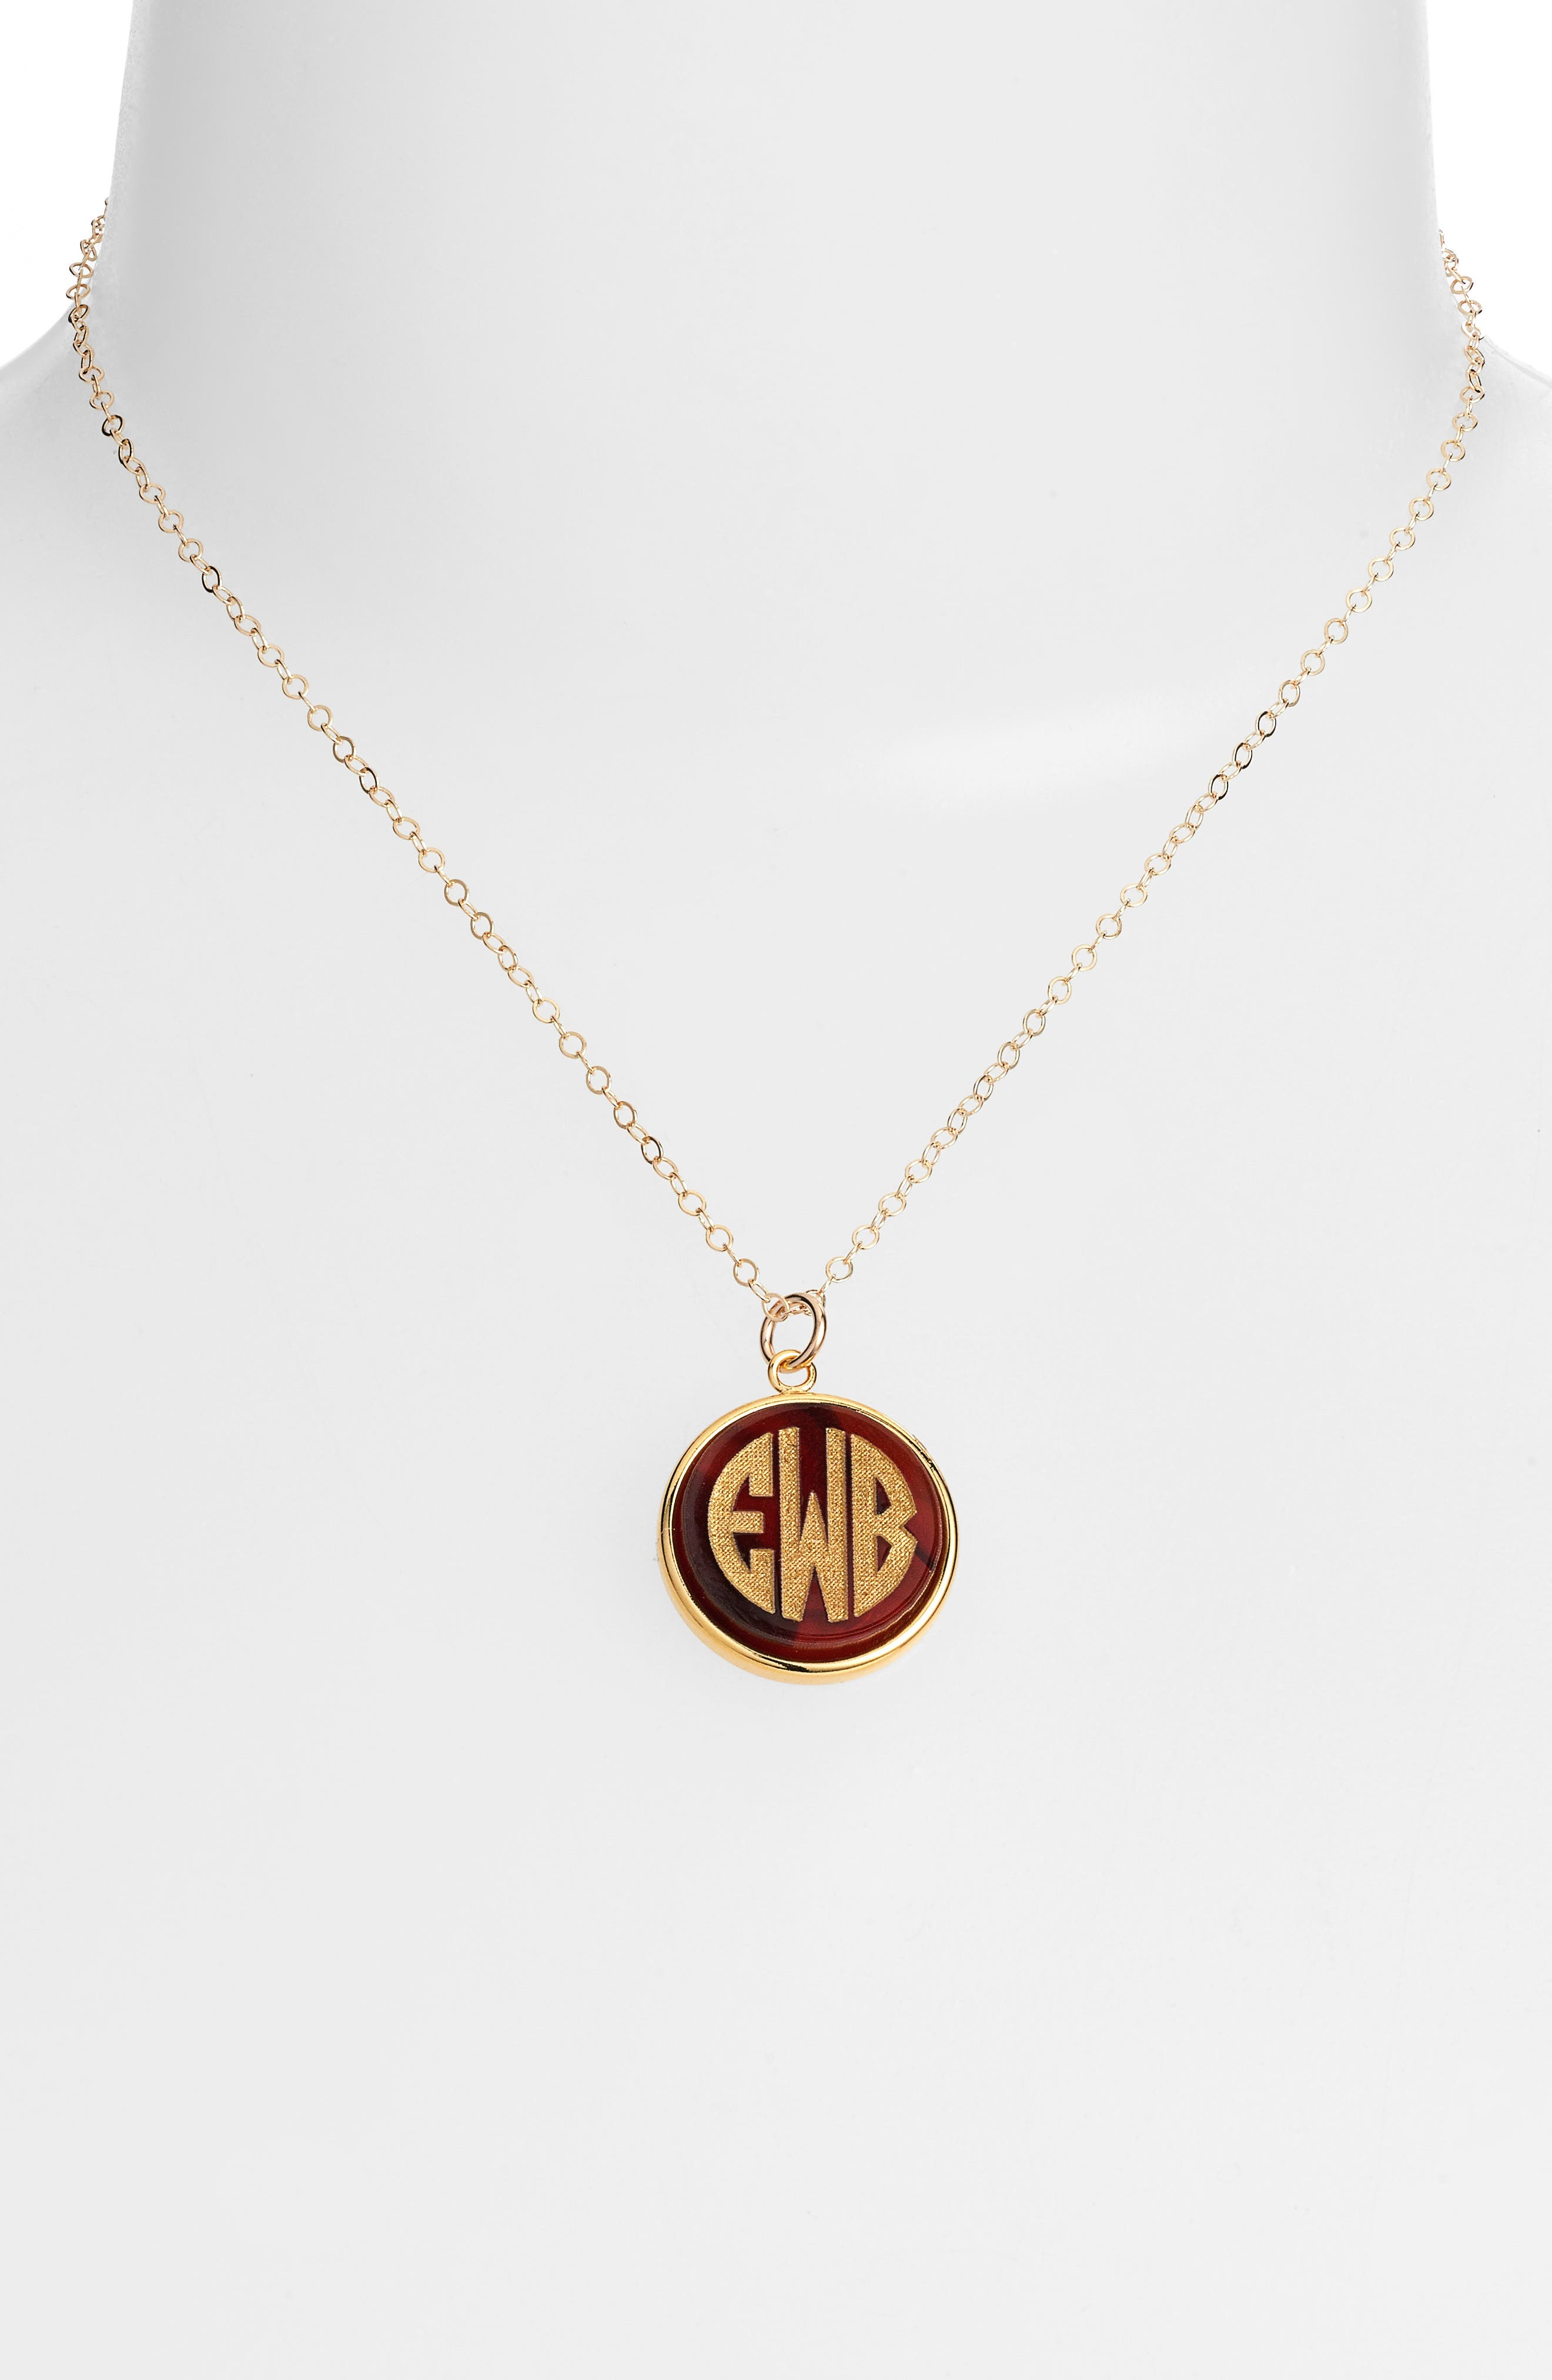 'Vineyard' Personalized Monogram Pendant Necklace,                             Alternate thumbnail 12, color,